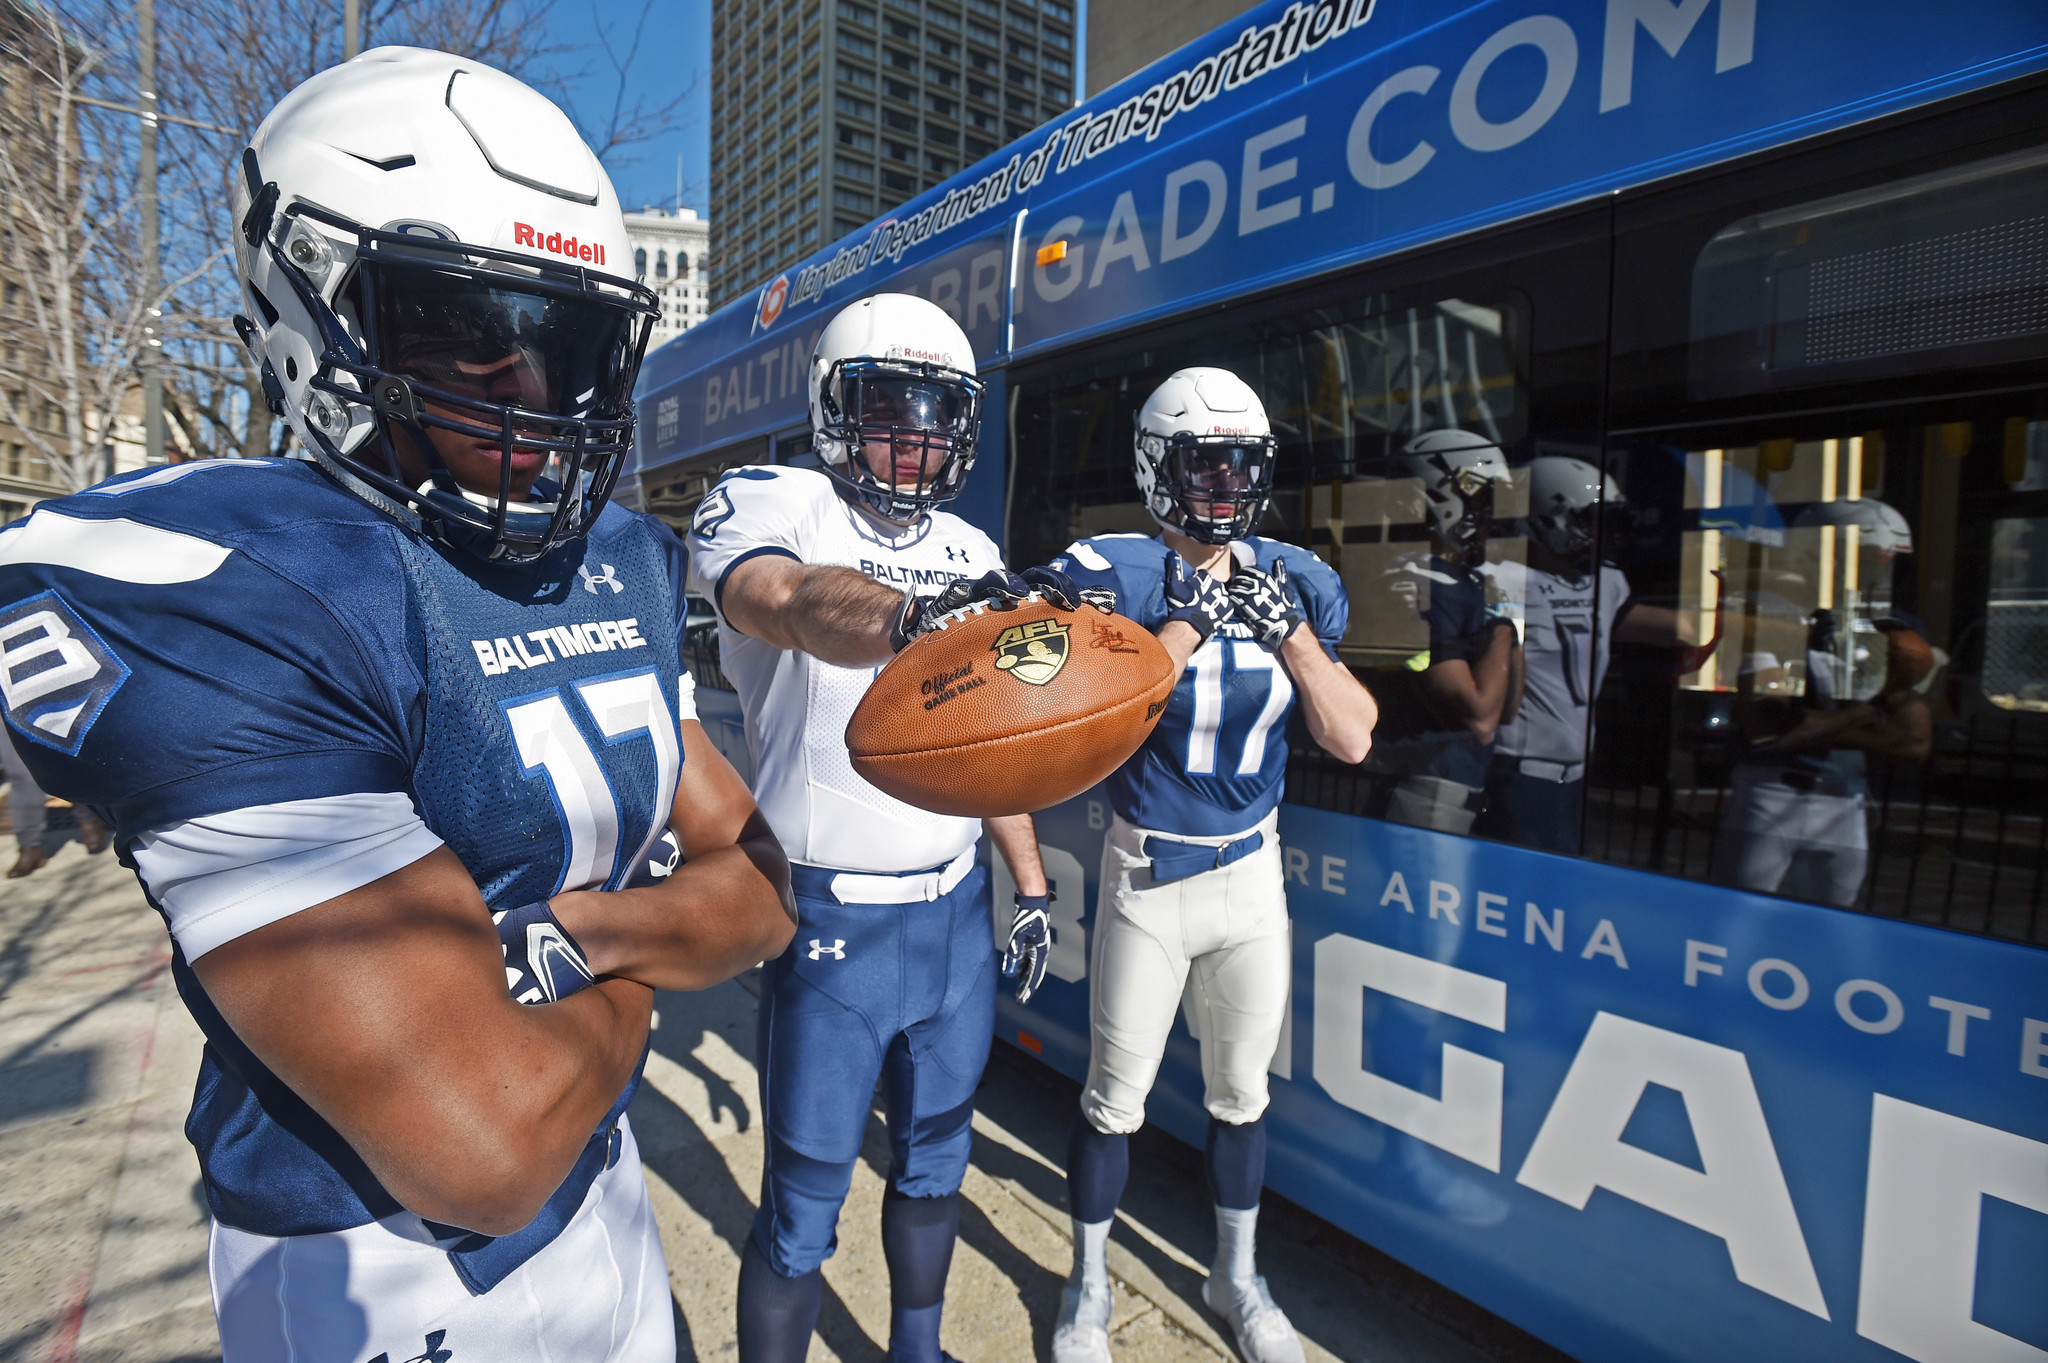 42df576cf New Arena Football League team faces branding challenges - Baltimore Sun